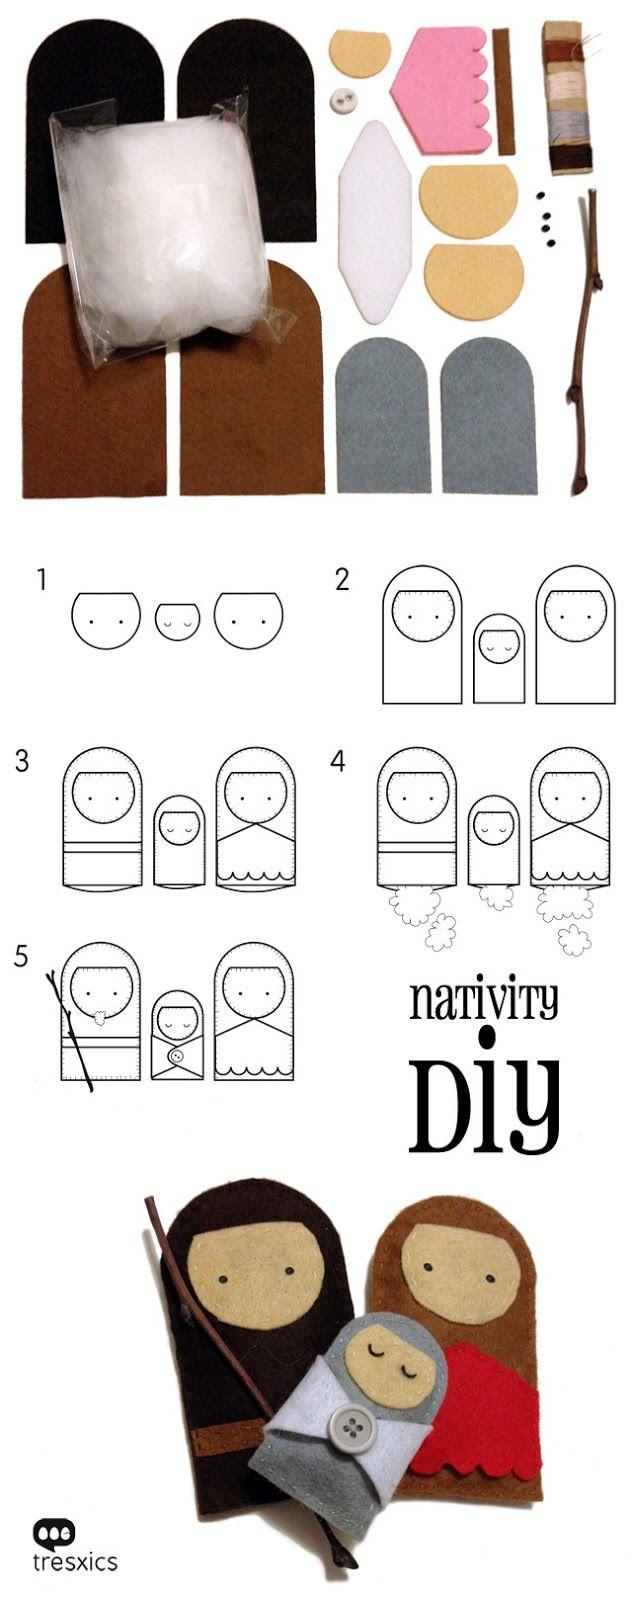 tresxics: Pessebre diy / Nativity scene diy. OUTDATED OFFER inspiration only.